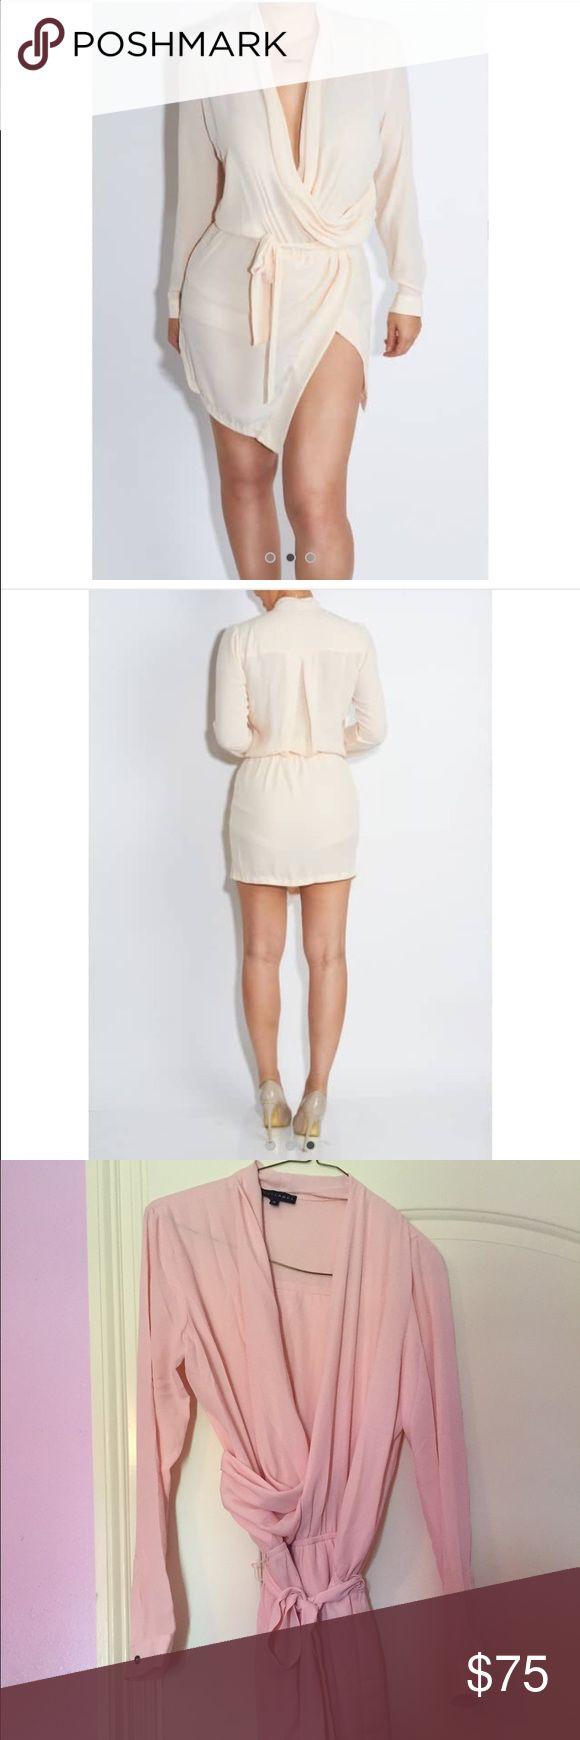 Side split Dress Beautiful! Fits me big! I can't return it. Size medium. Brand new! Rose color. Has shorts underneath. Dresses Midi